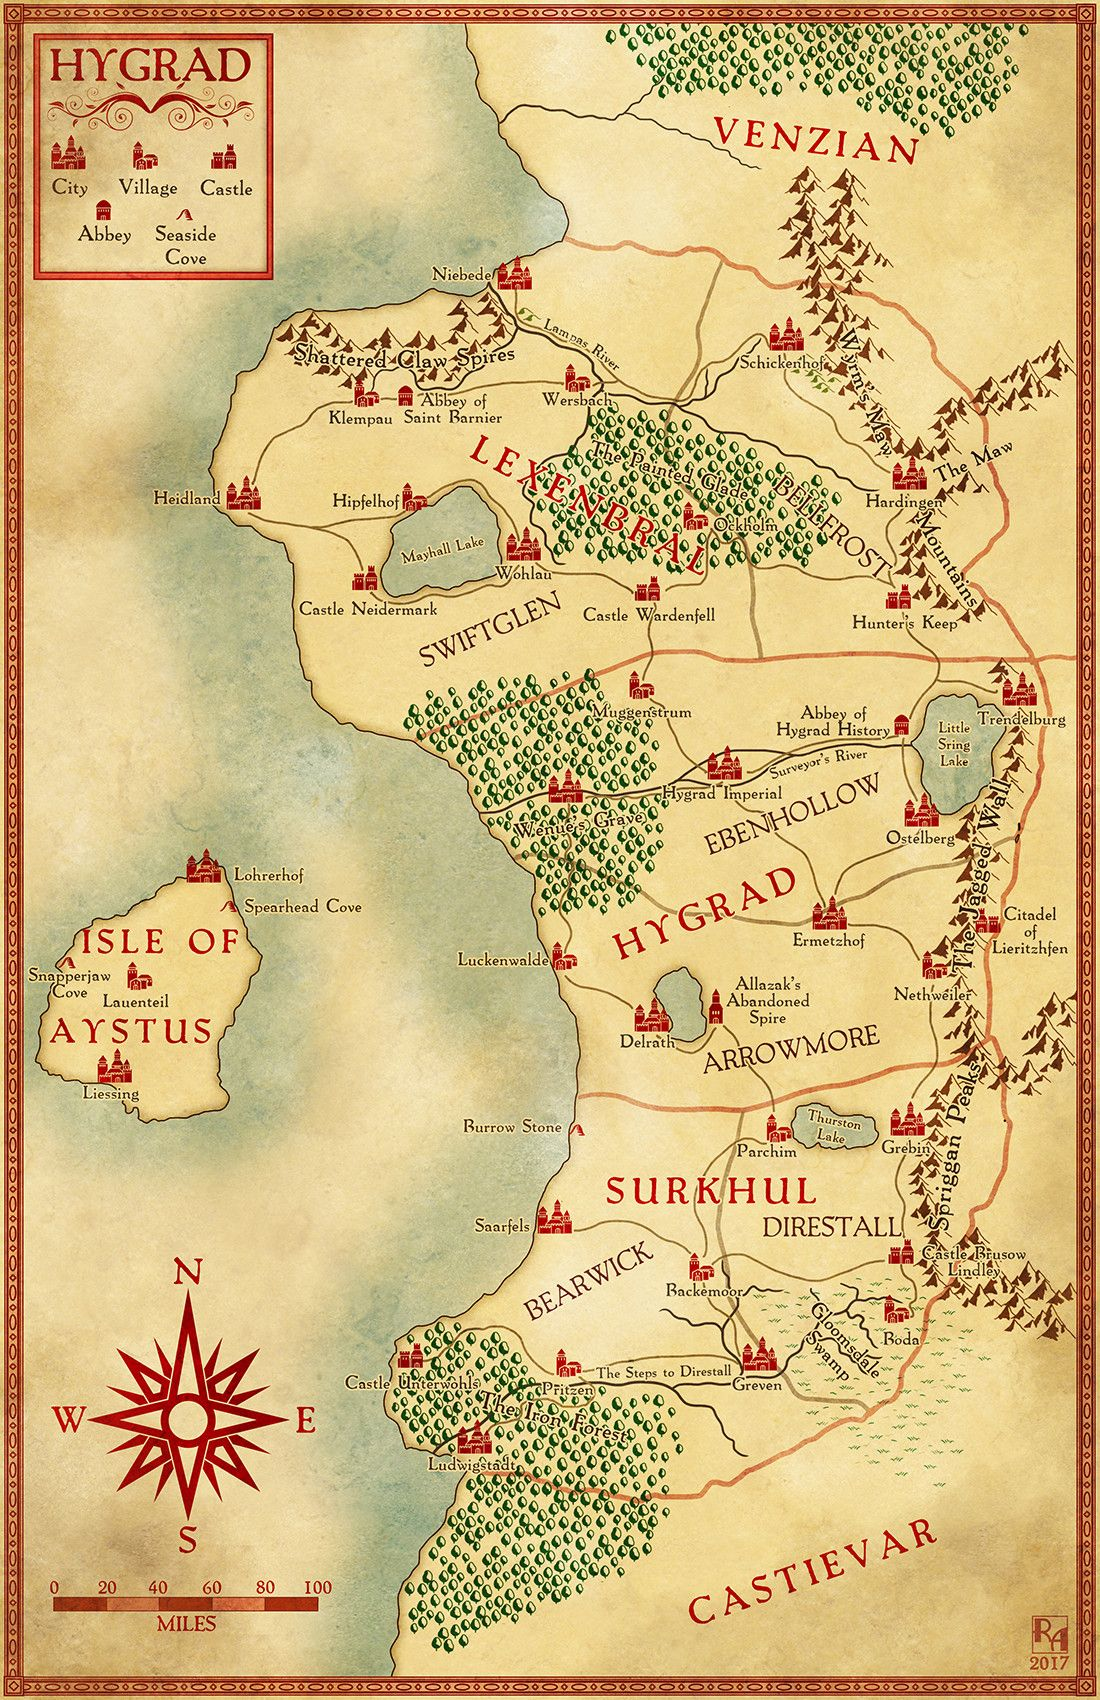 ArtStation Hygrad Robert Altbauer Fantasy RPG Maps